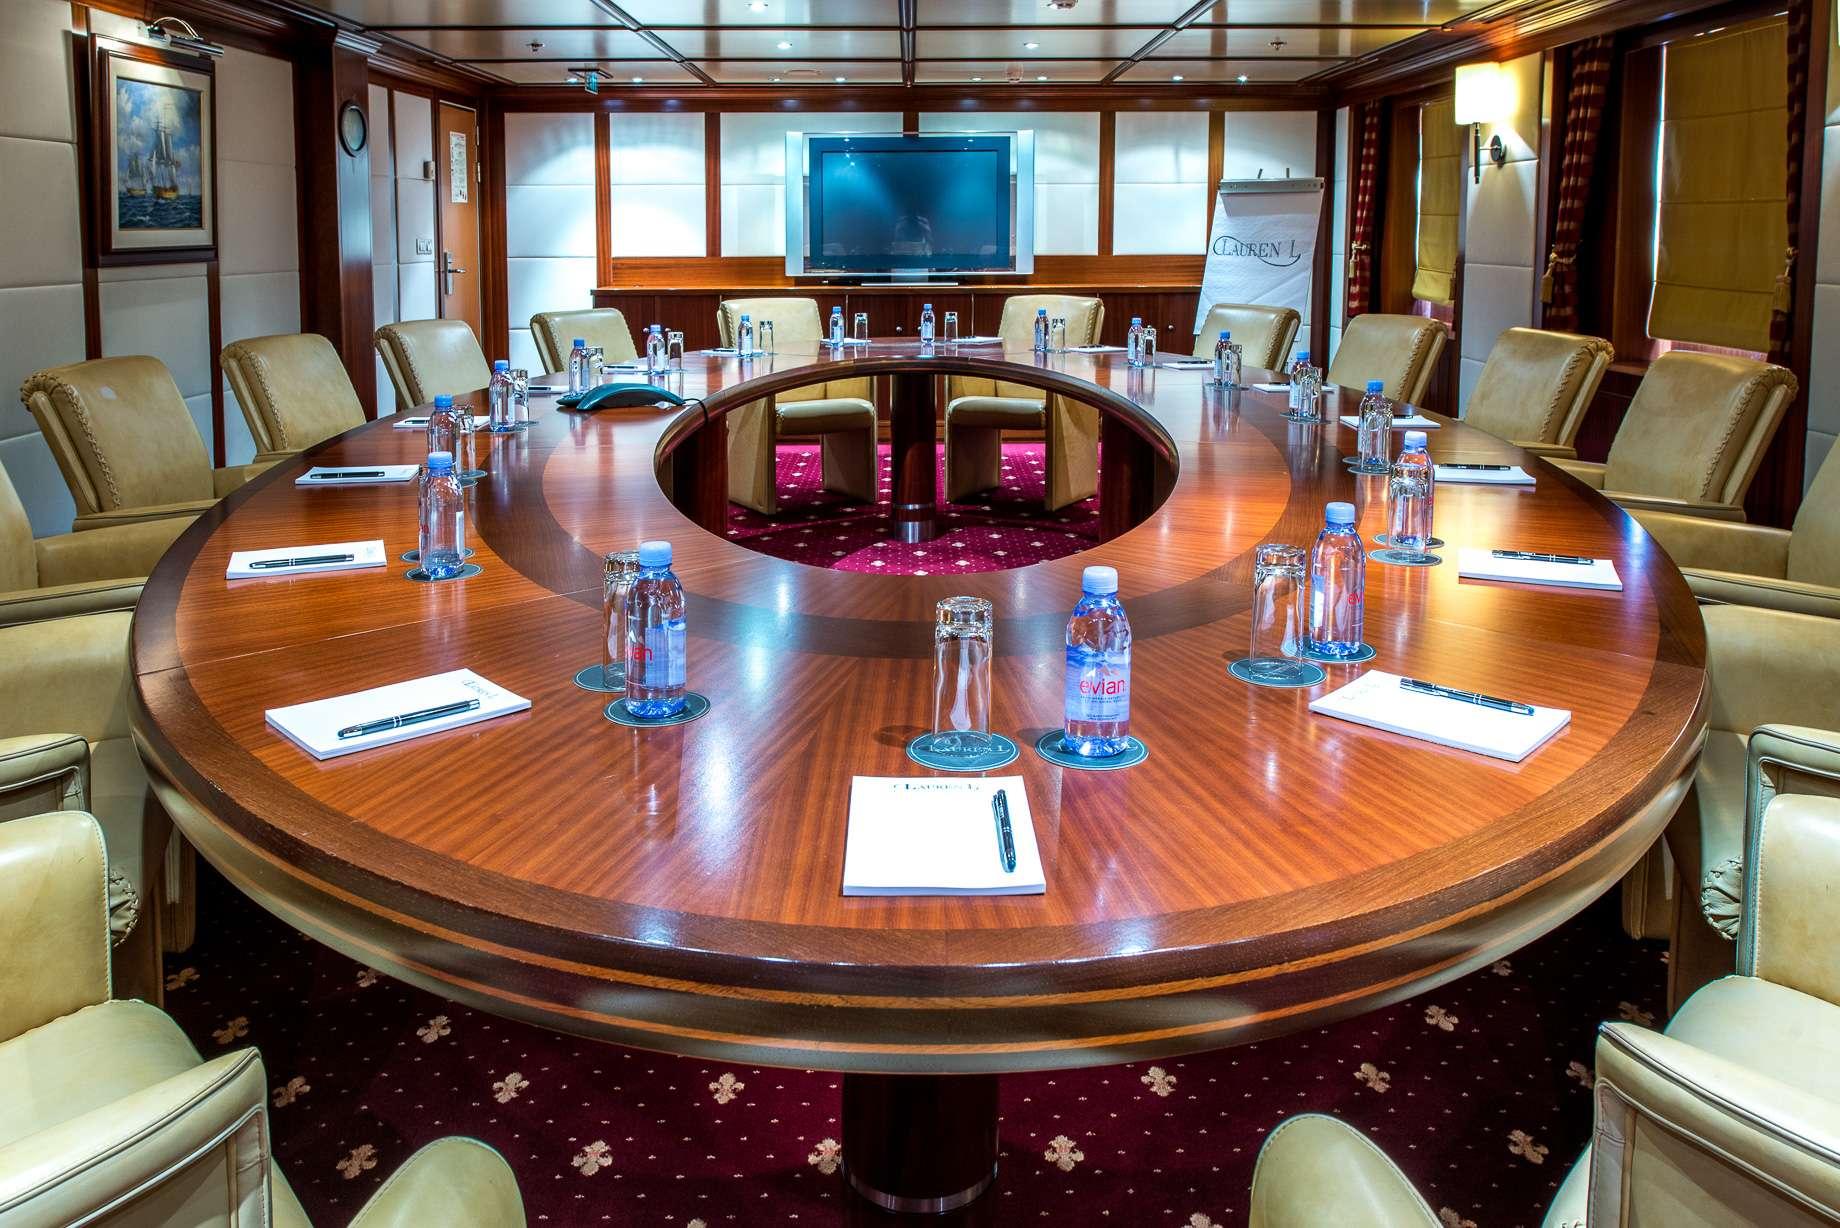 Motor Yacht 'LAUREN L' conference room, 40 PAX, 295.00 Ft, 90.00 Meters, Built 2002, Cassens Werft, Refit Year 2008/2015